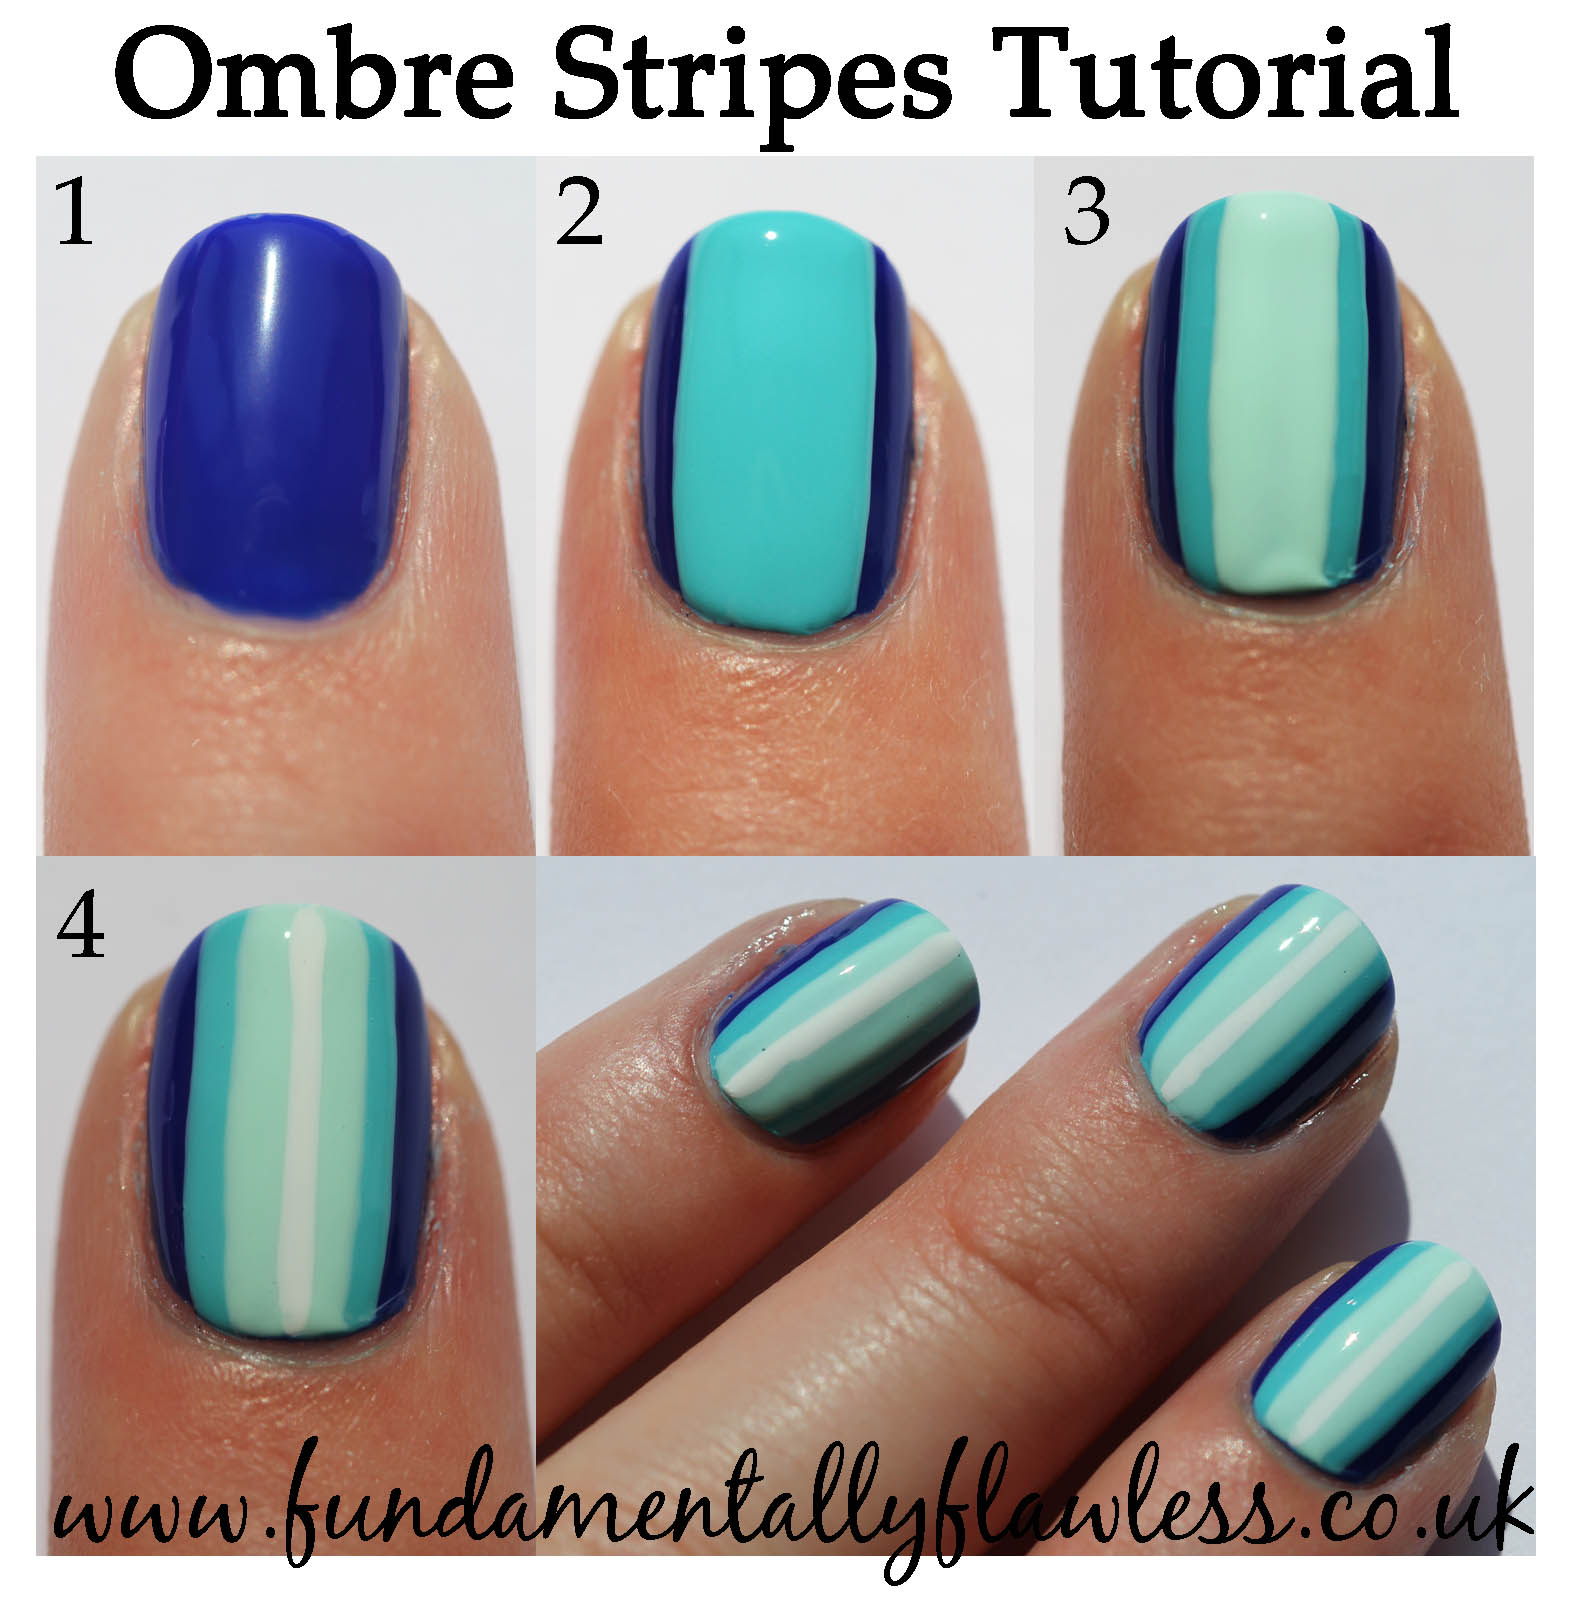 Fundamentally Flawless: Blue Ombre Stripes Nail Art Tutorial